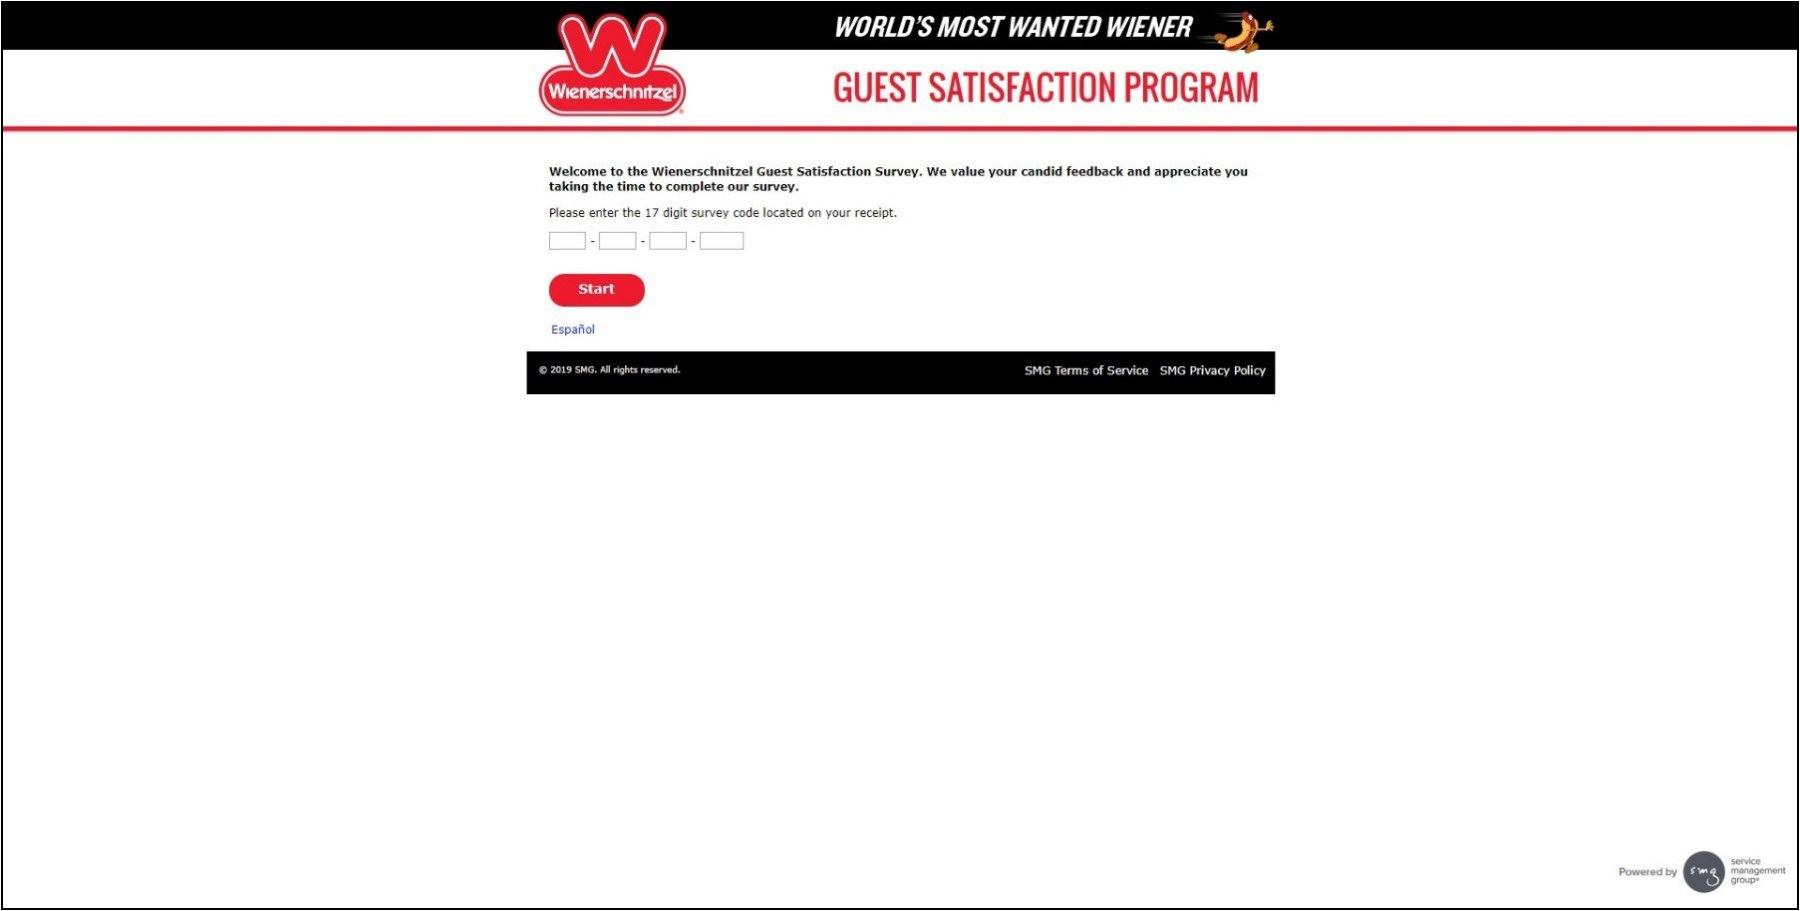 www.hotdog.smg.com